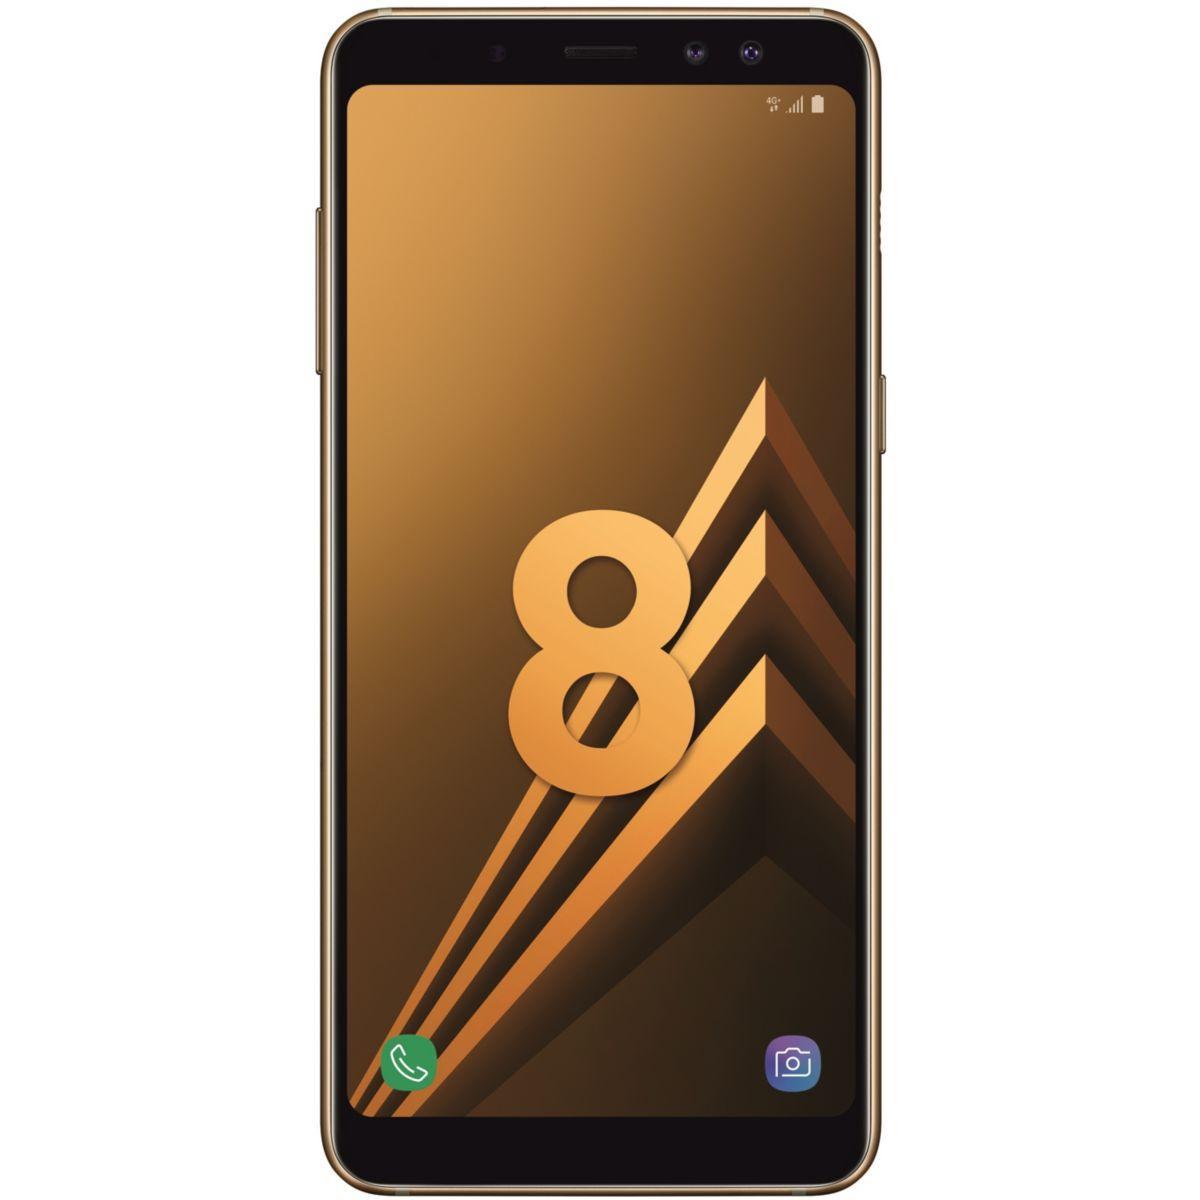 Smartphone samsung galaxy a8 gold dual s - livraison offerte : code liv